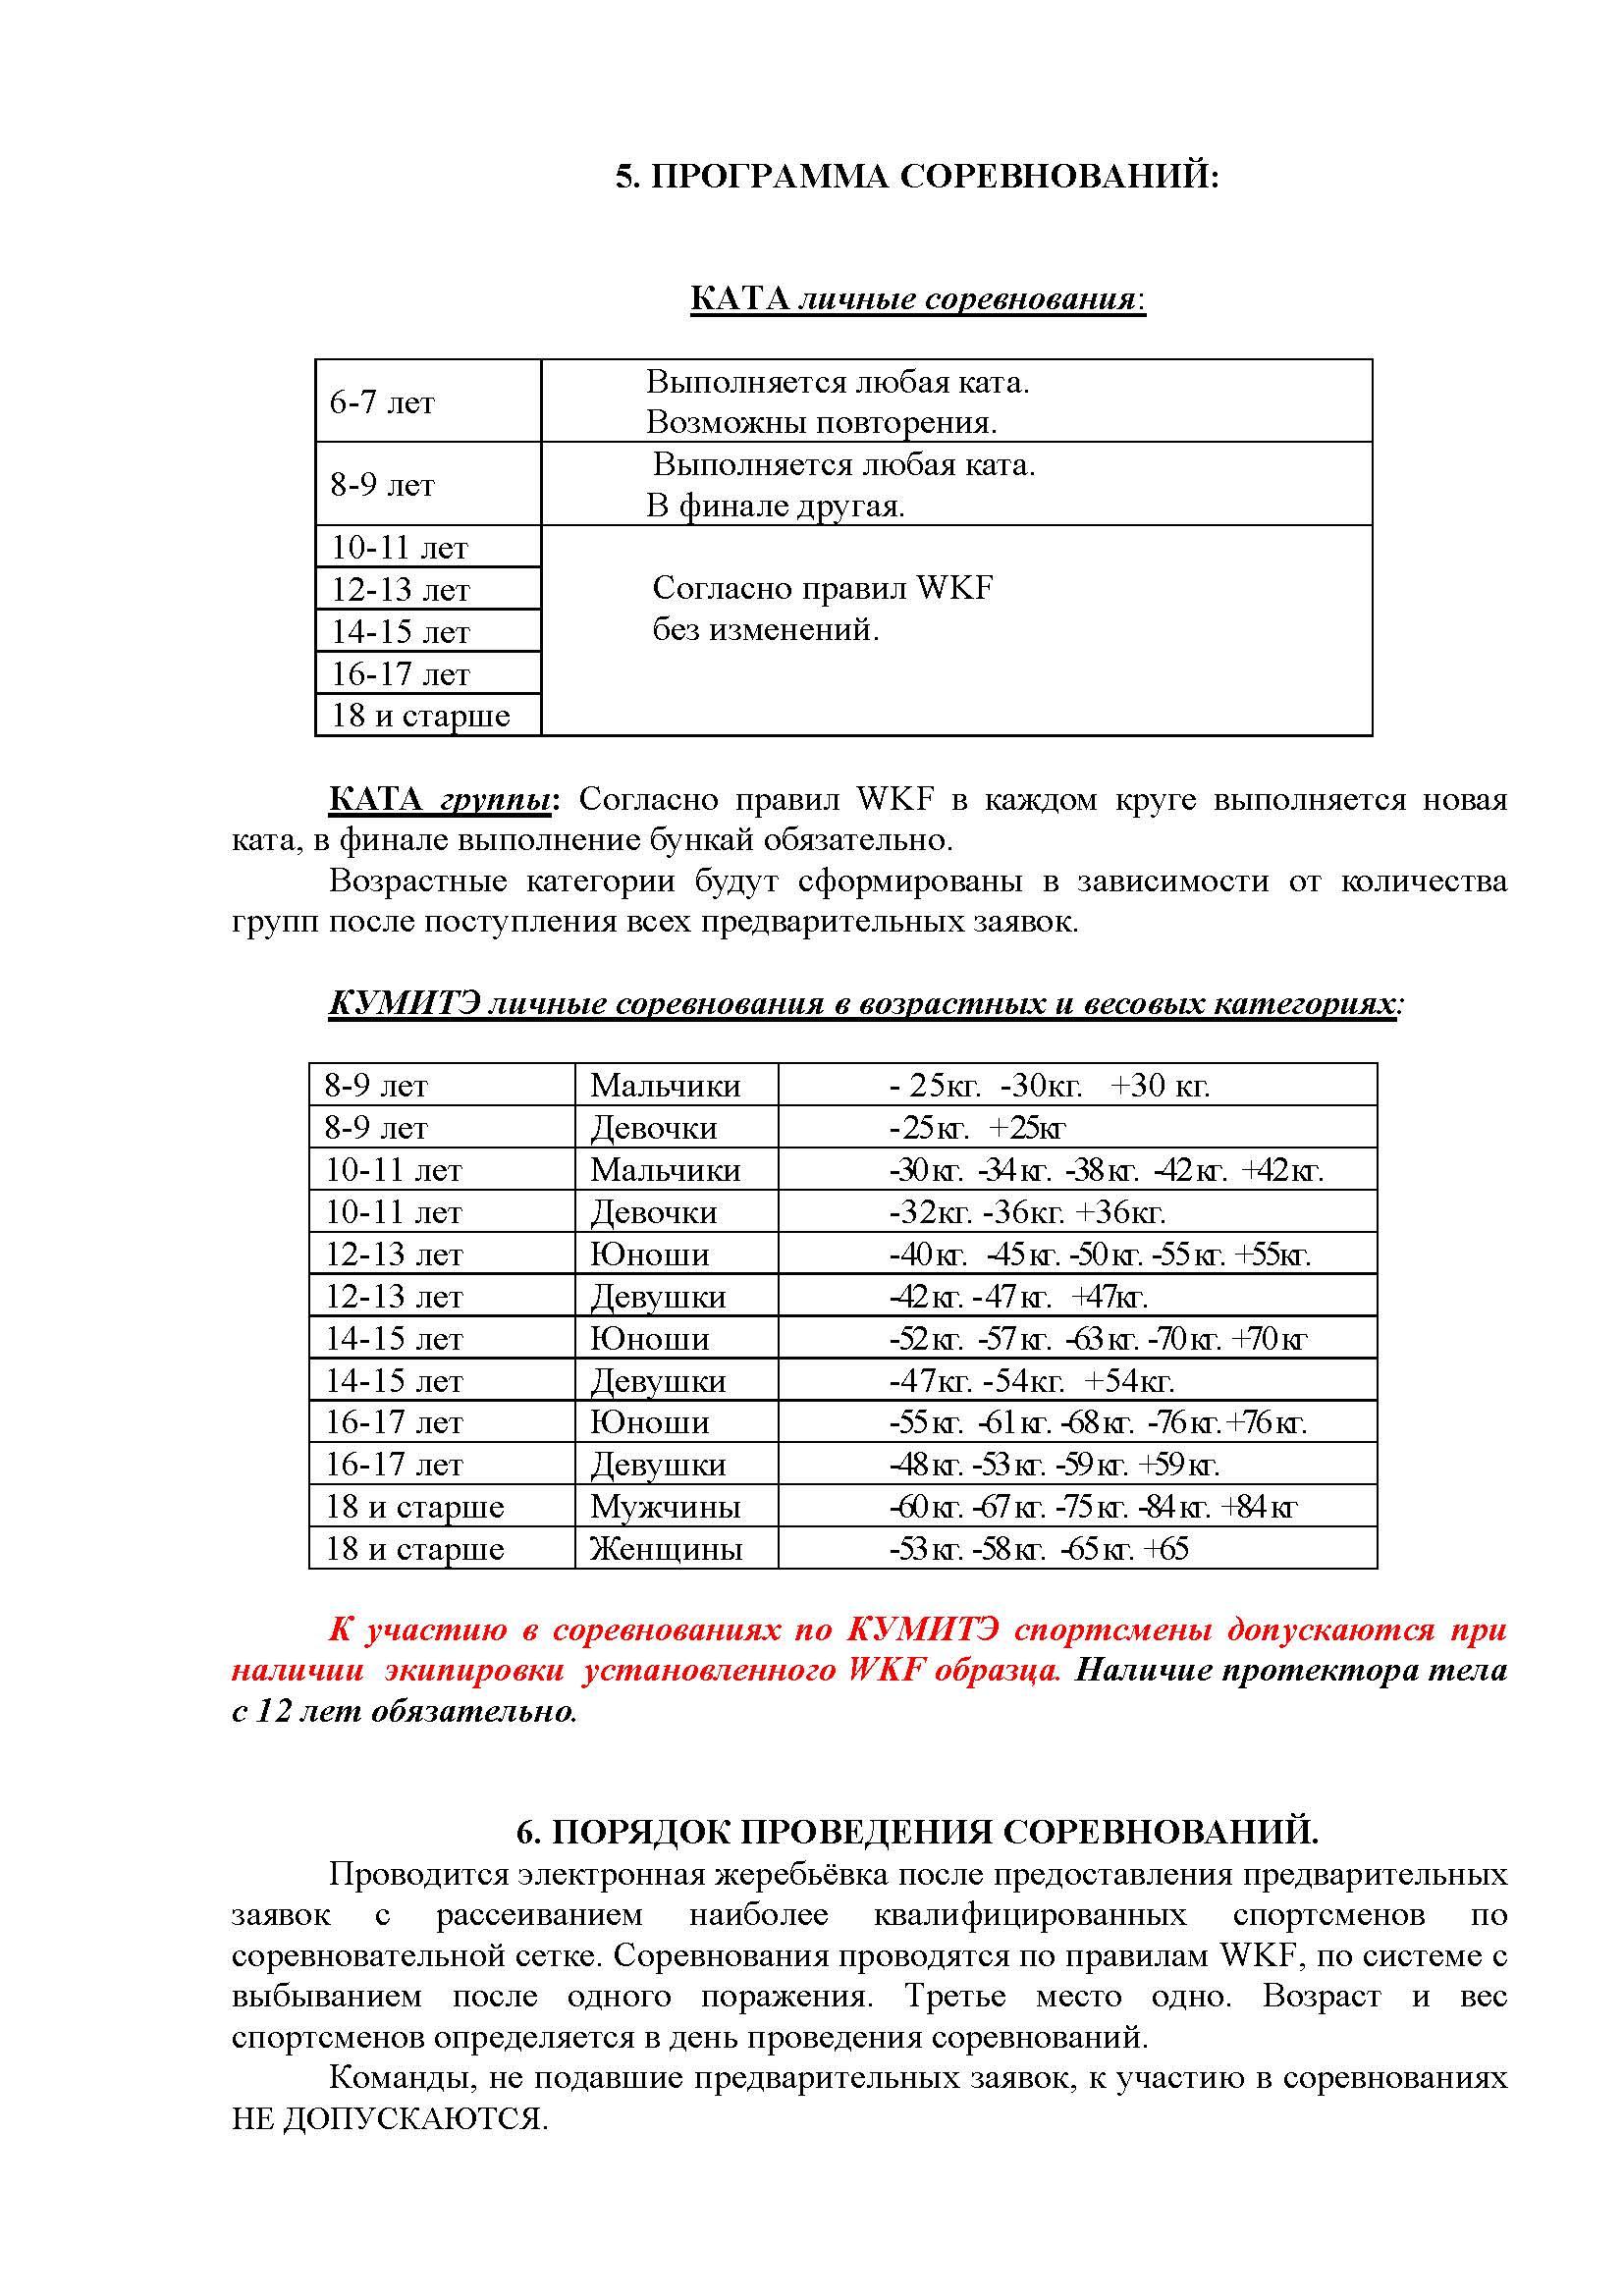 ПиЧ каратэ г. Великие Луки 2018_Страница_2